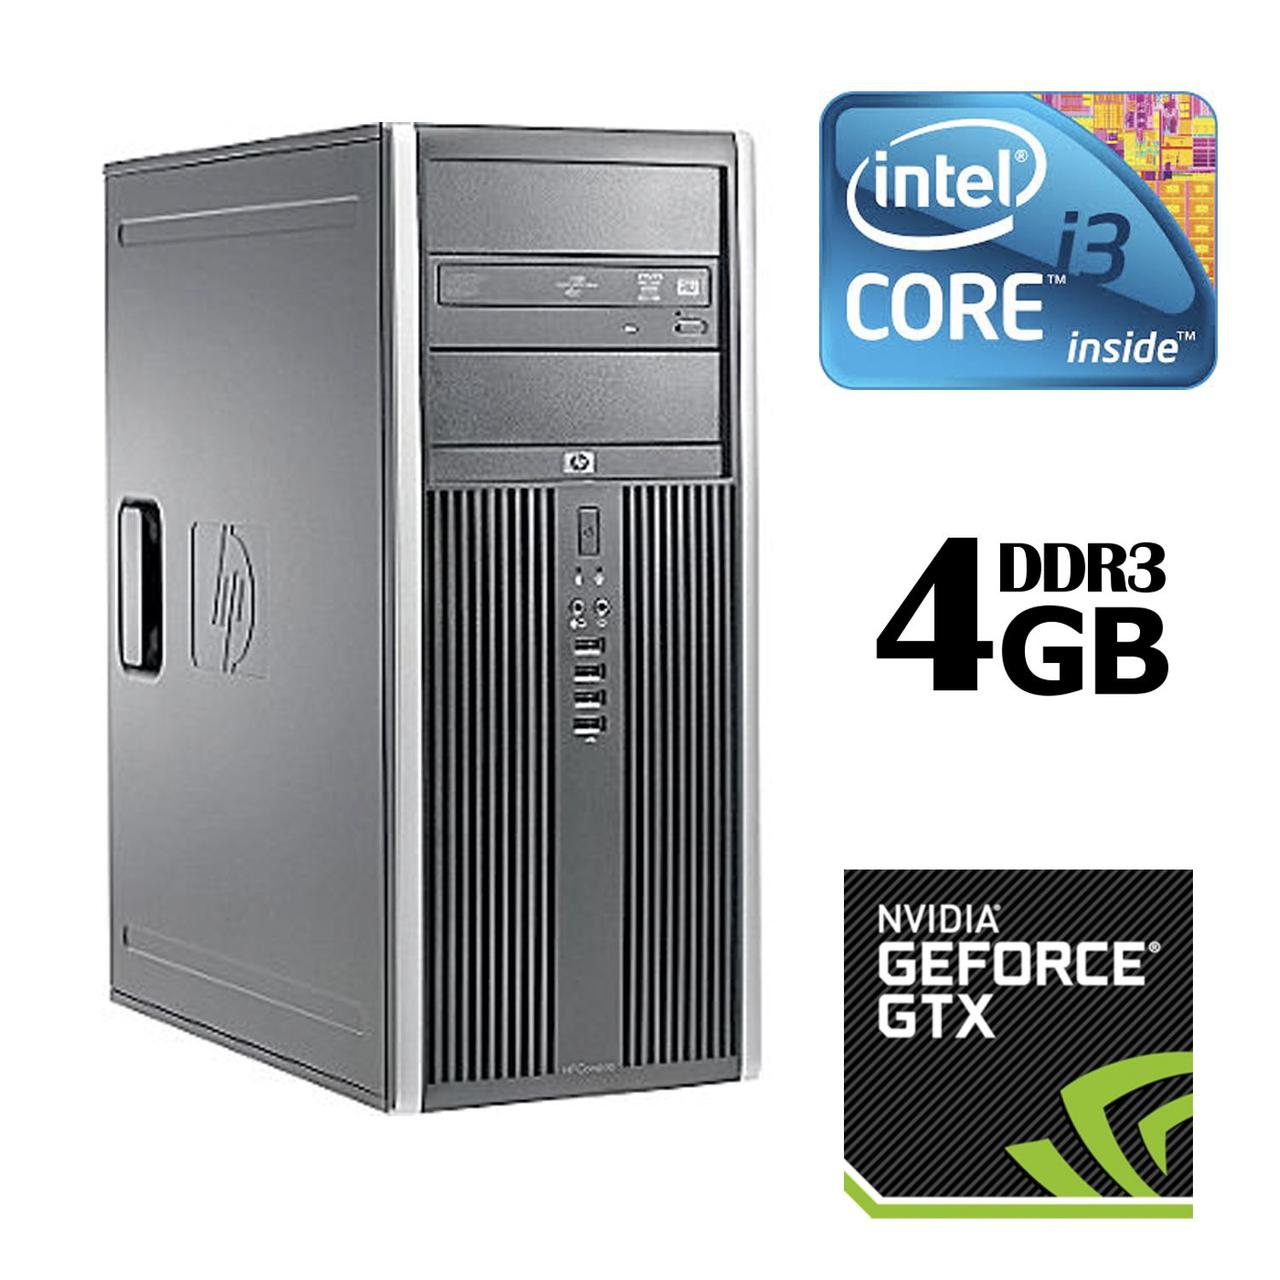 HP Compaq 8100 Elite Tower / Intel® Core™ i3-530 (2 (4) ядра по 2.93 GHz) / 4GB DDR3 / 320GB HDD / nVidia GeForce GTX 550 Ti 1GB (2xDVI, miniHDMI)